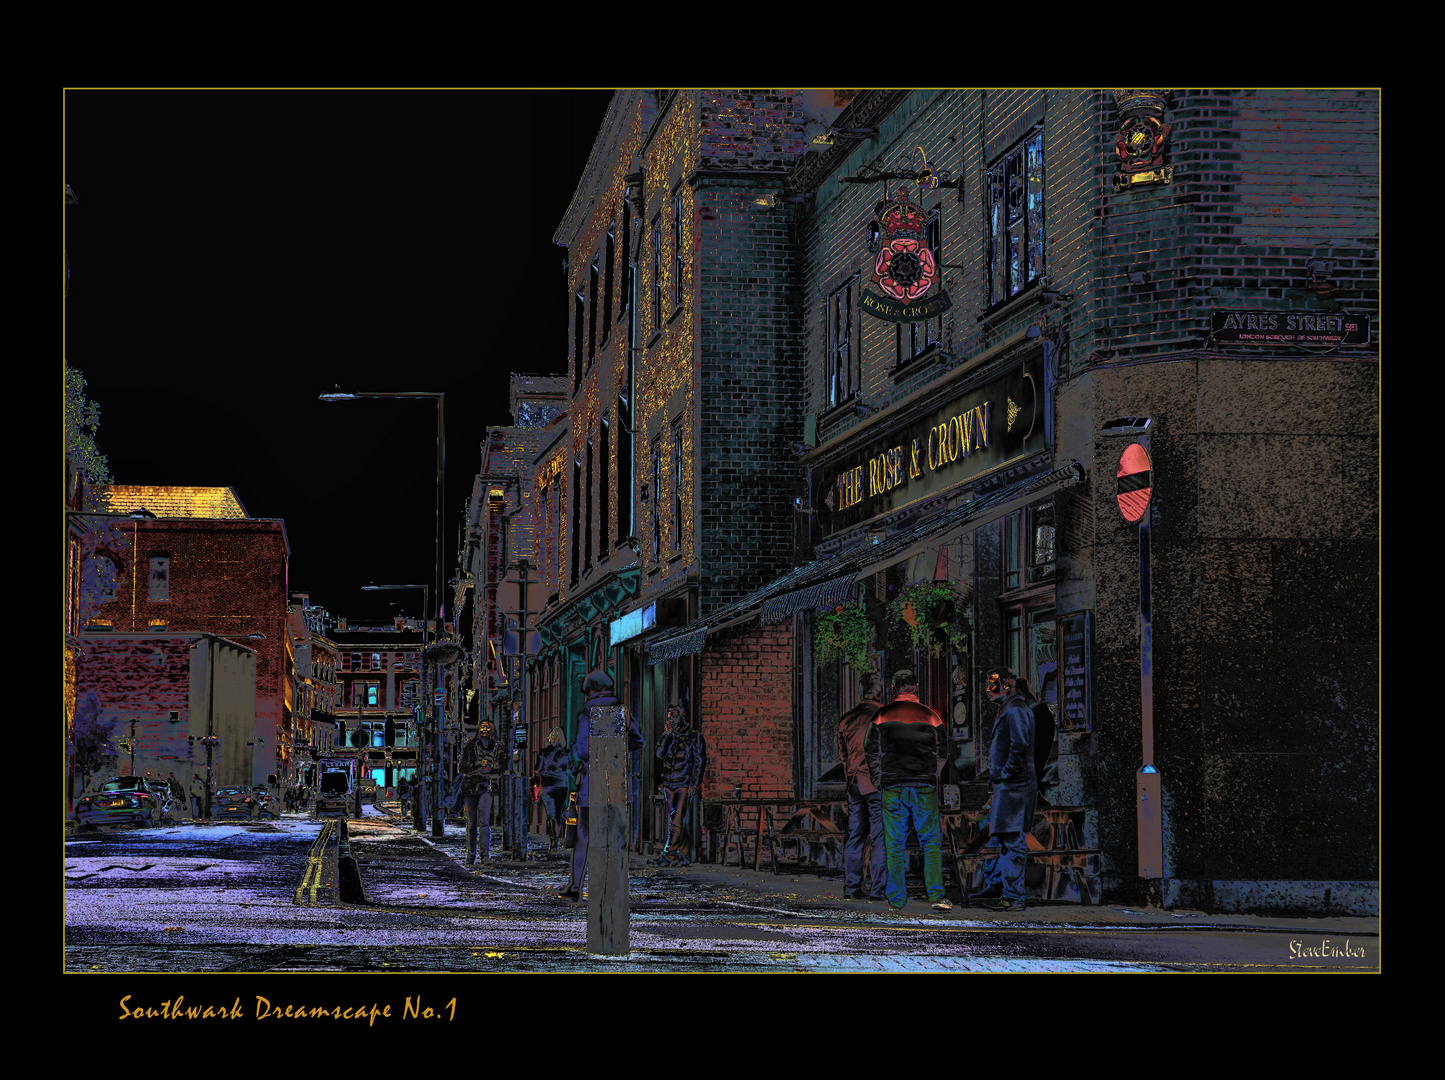 Southwark Dreamscape No.1